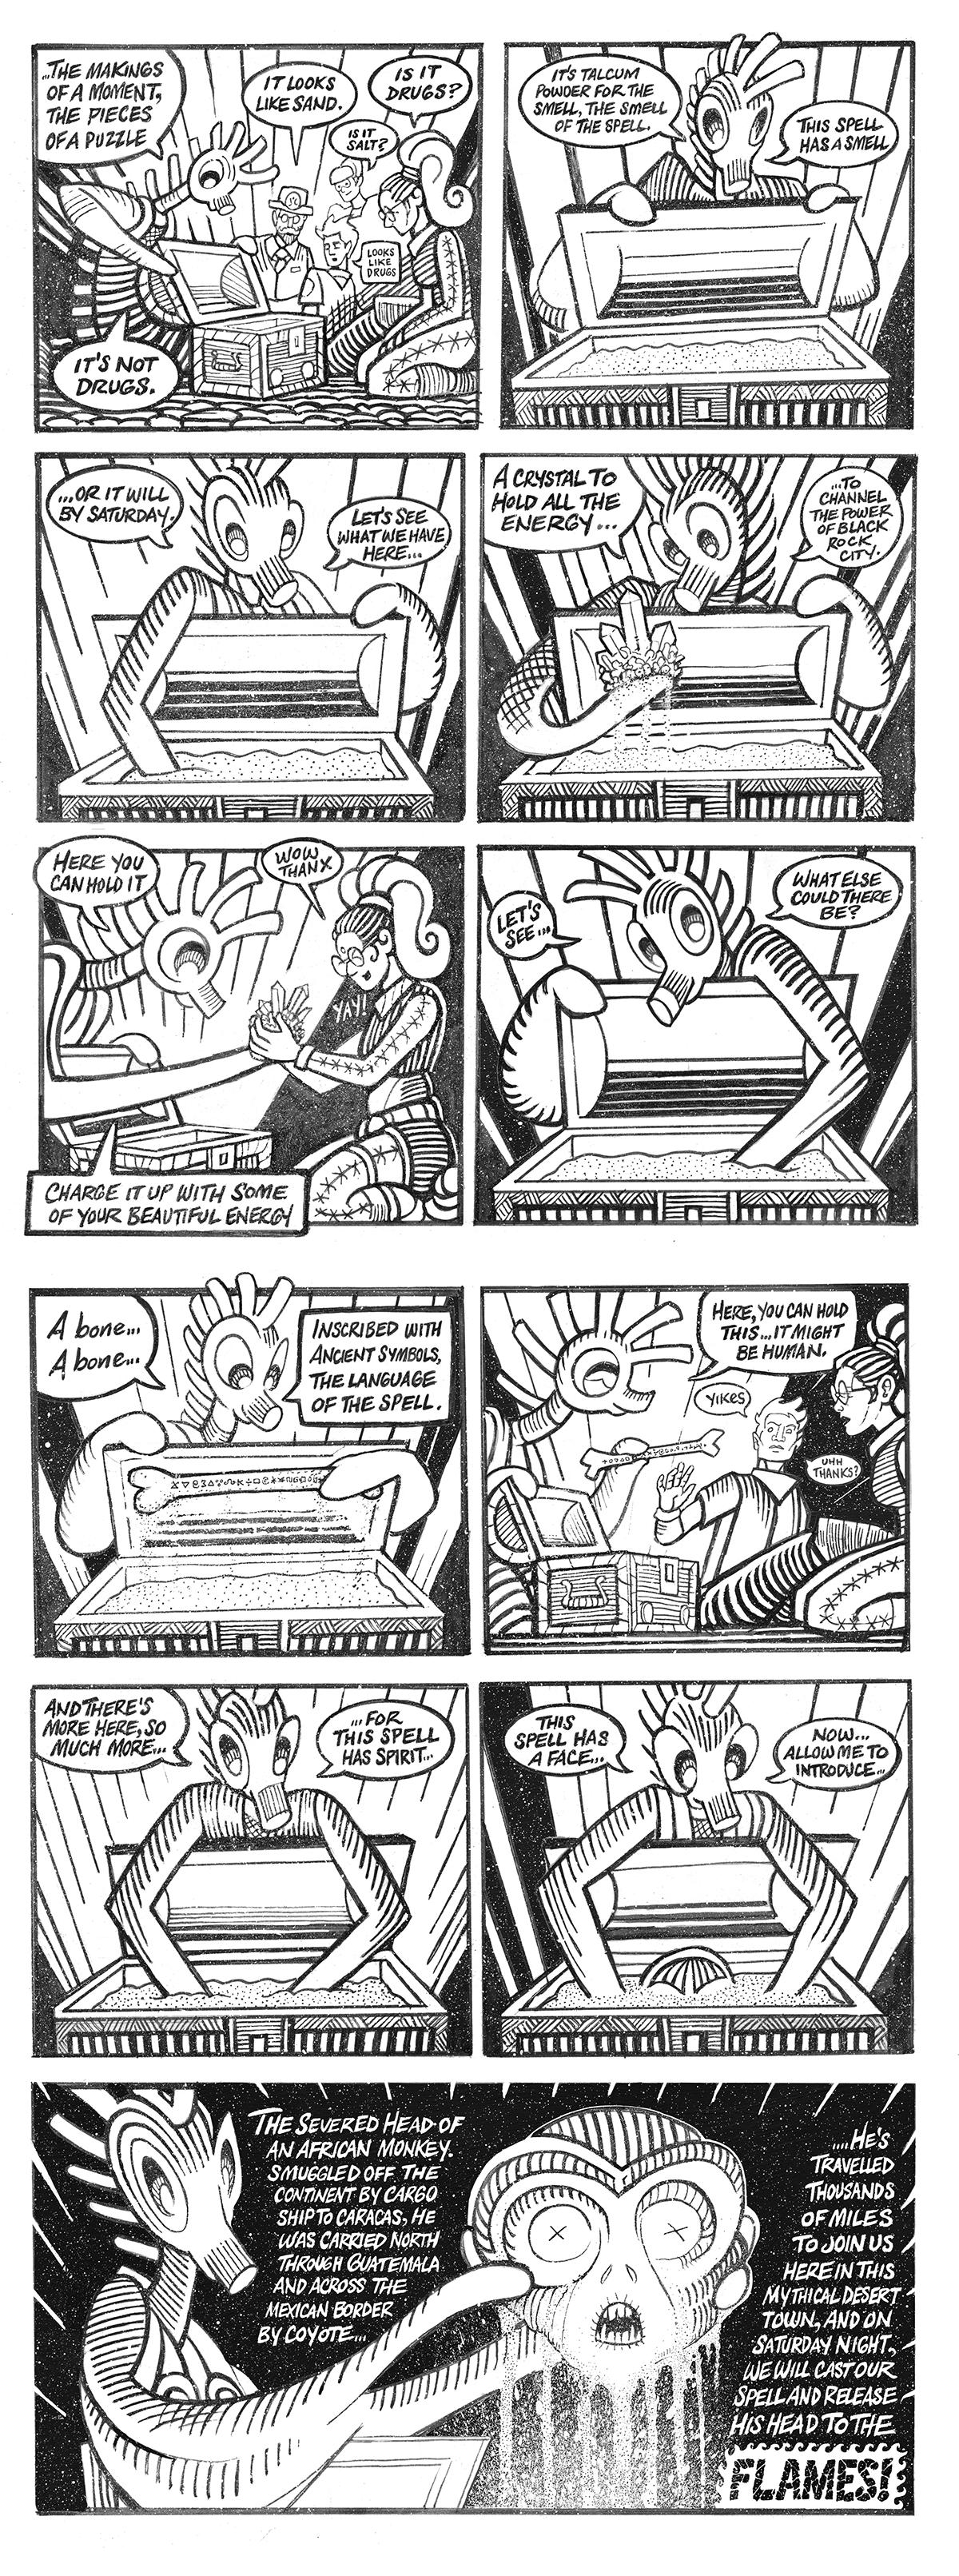 236: Puzzle Pieces